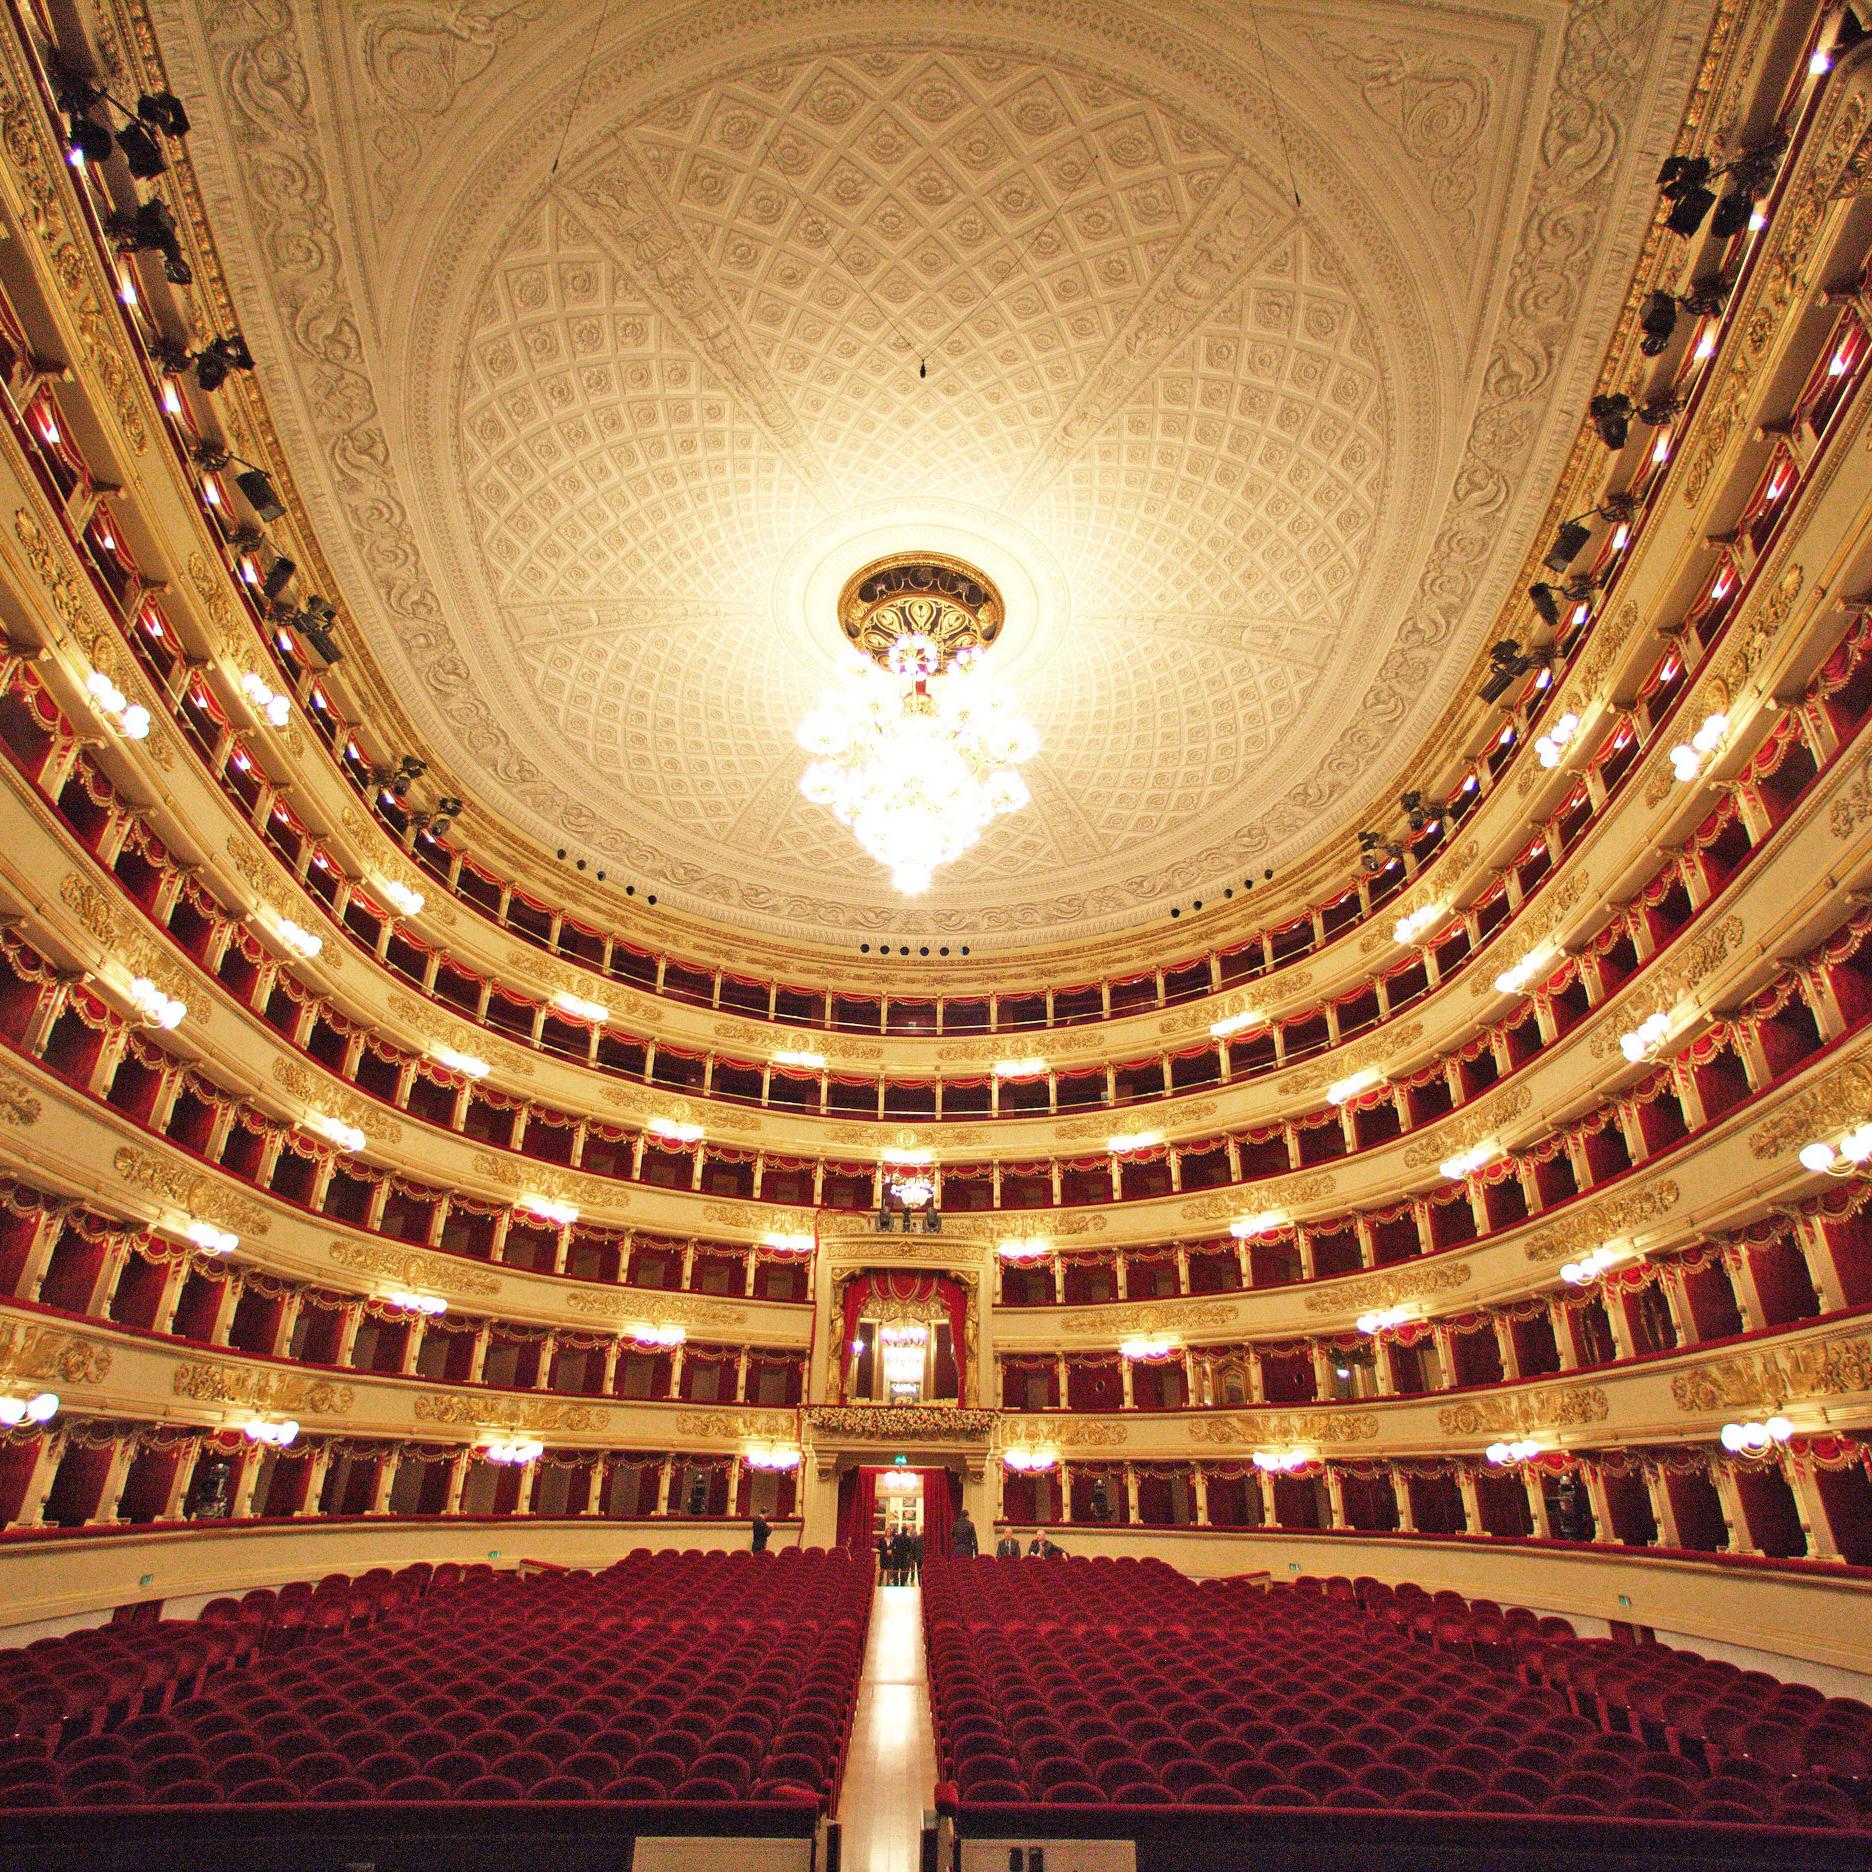 Teatro alla Scala debut